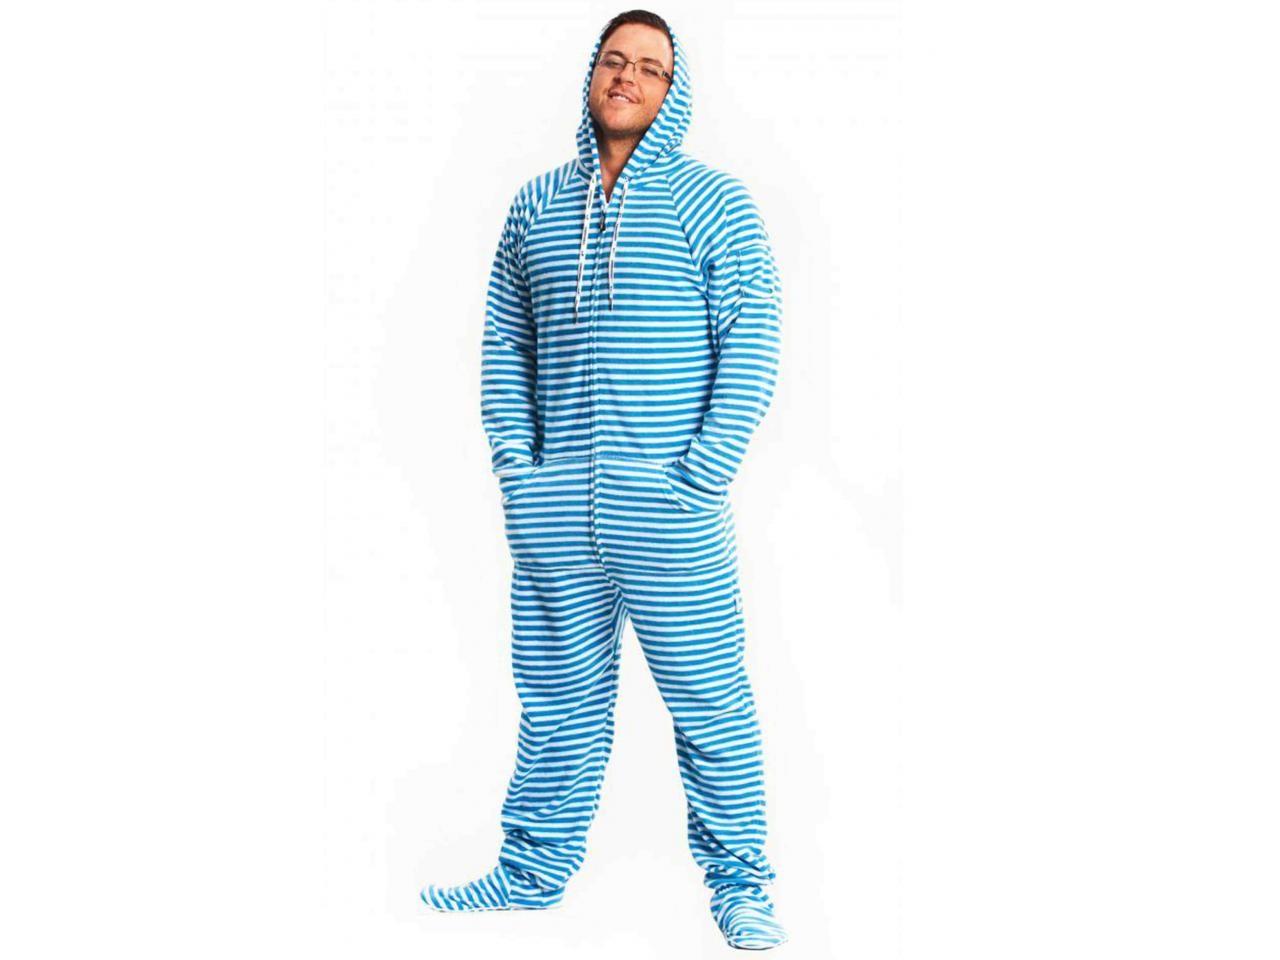 Blue Stripped Adult Pajama onesie | ABDL stuff | Pinterest ...